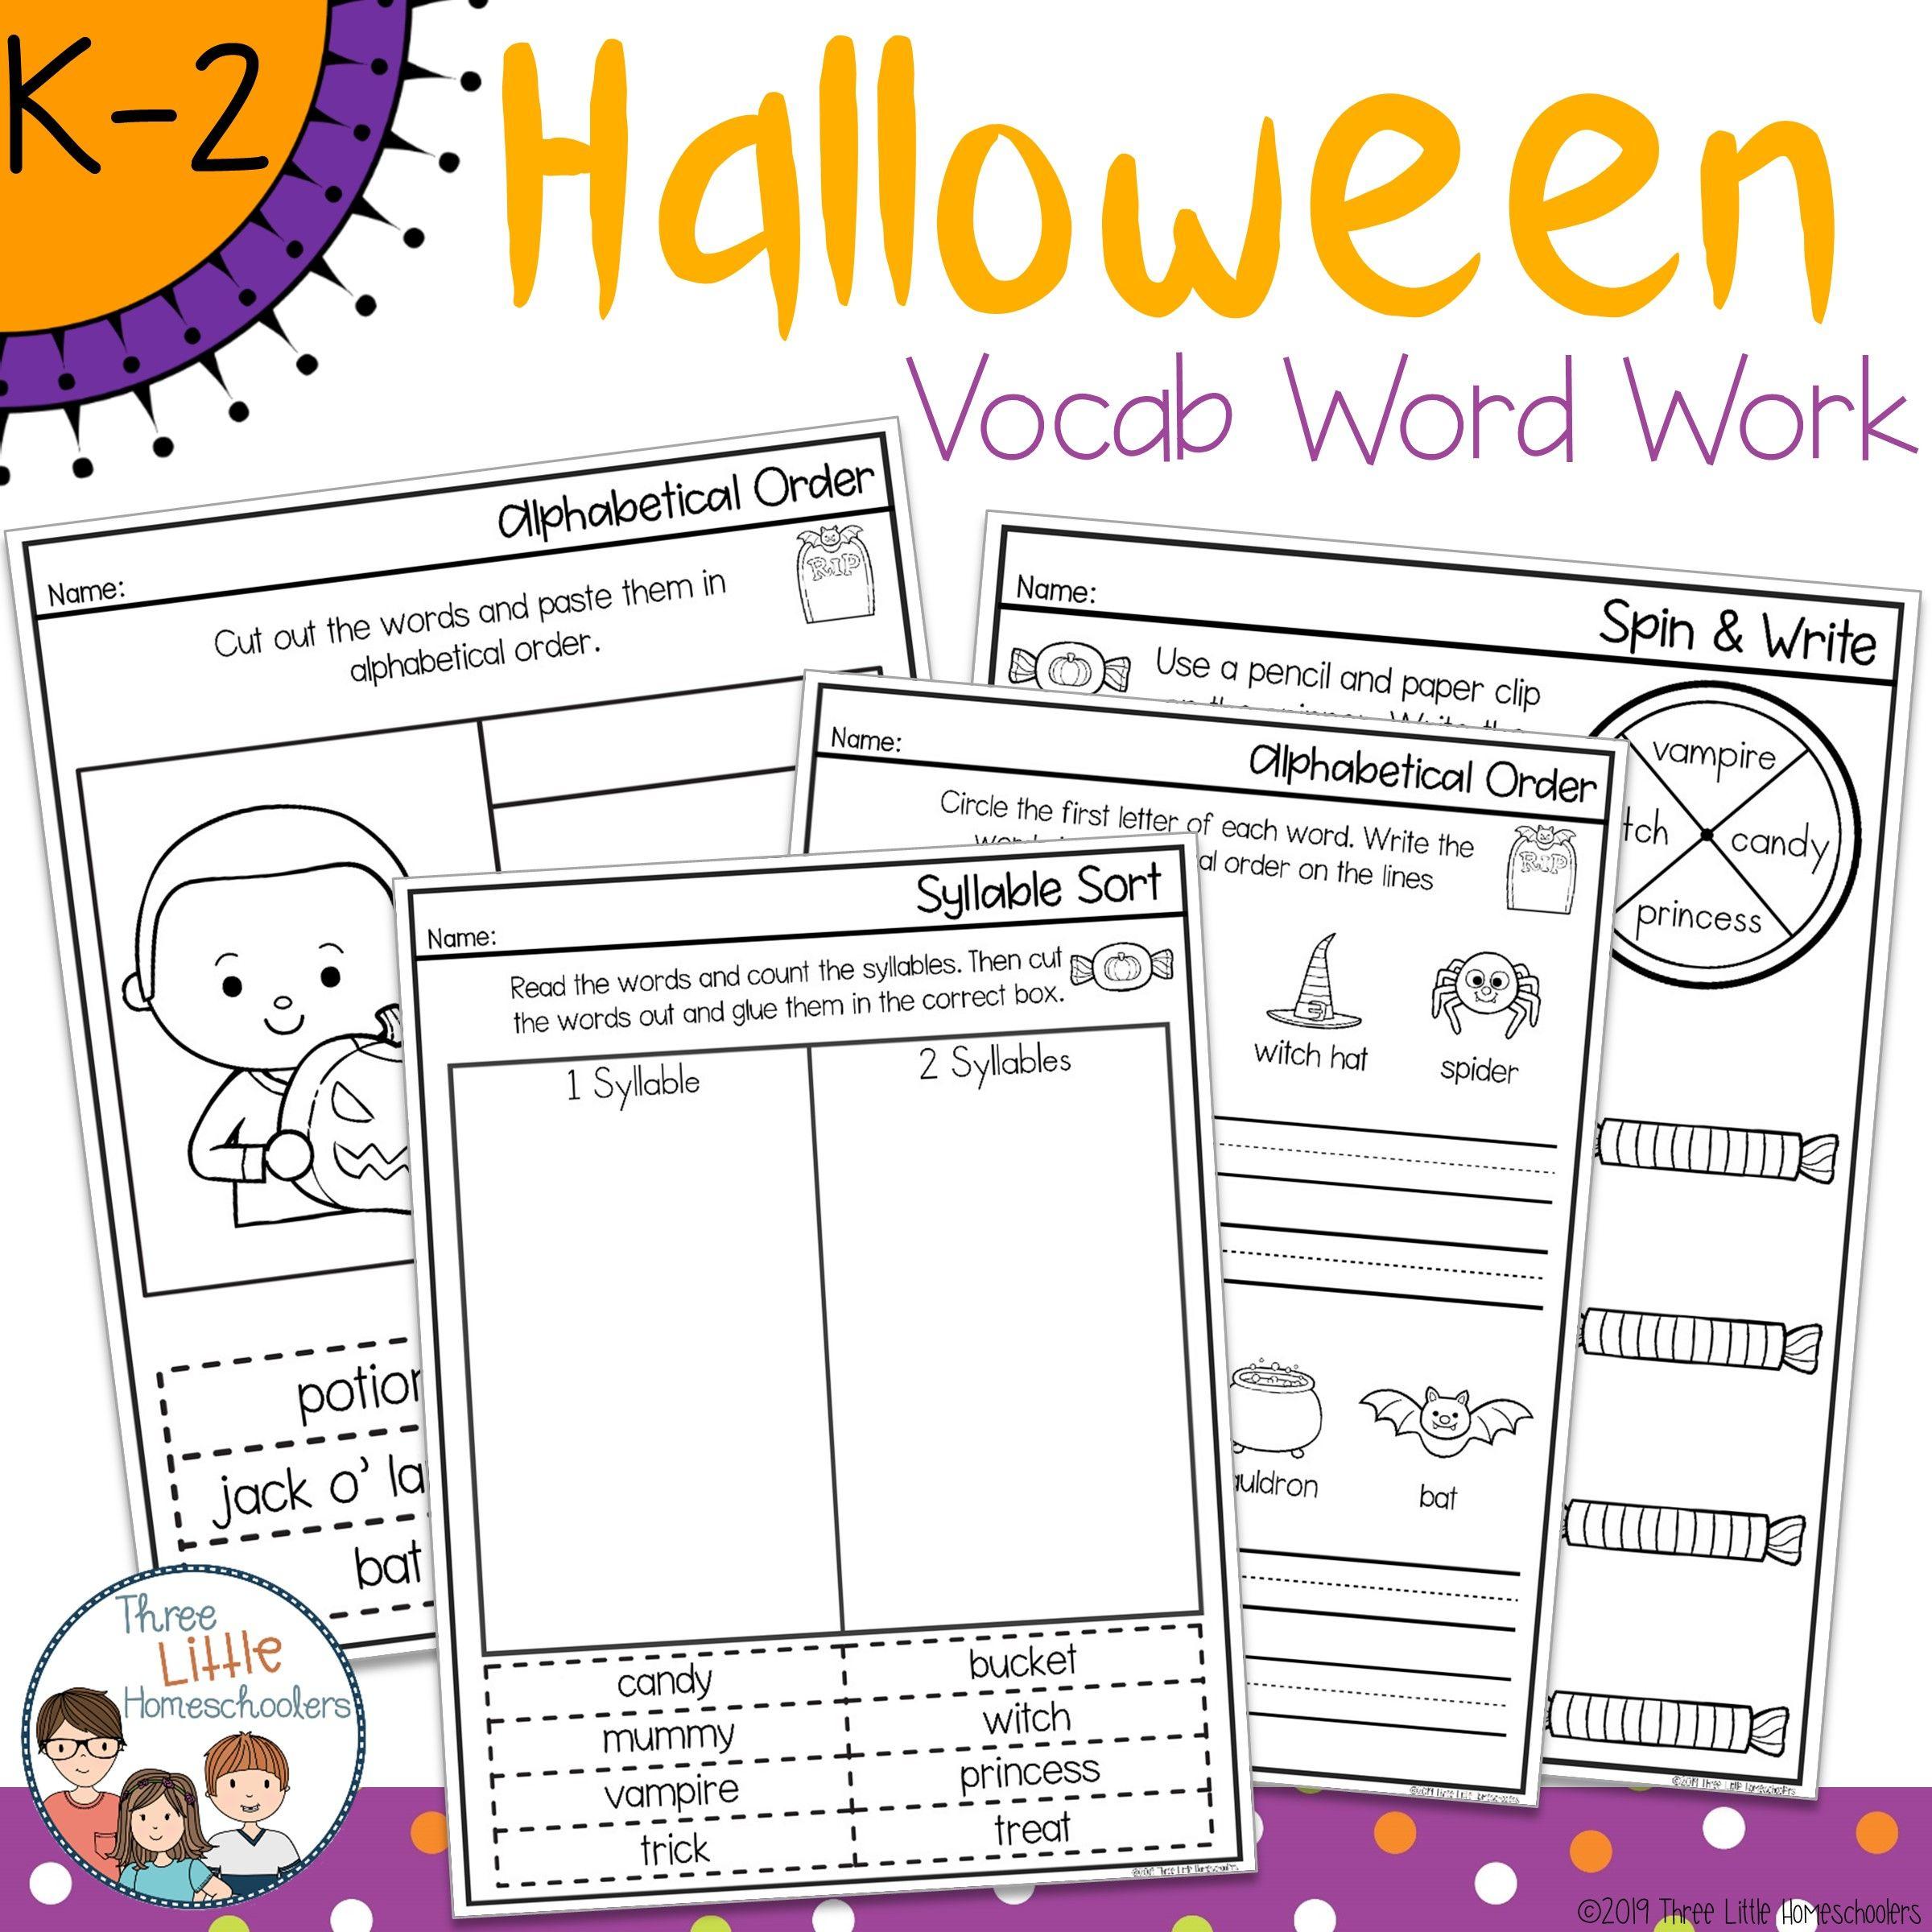 Halloween Themed Vocabulary Word Work - No Prep | Spelling